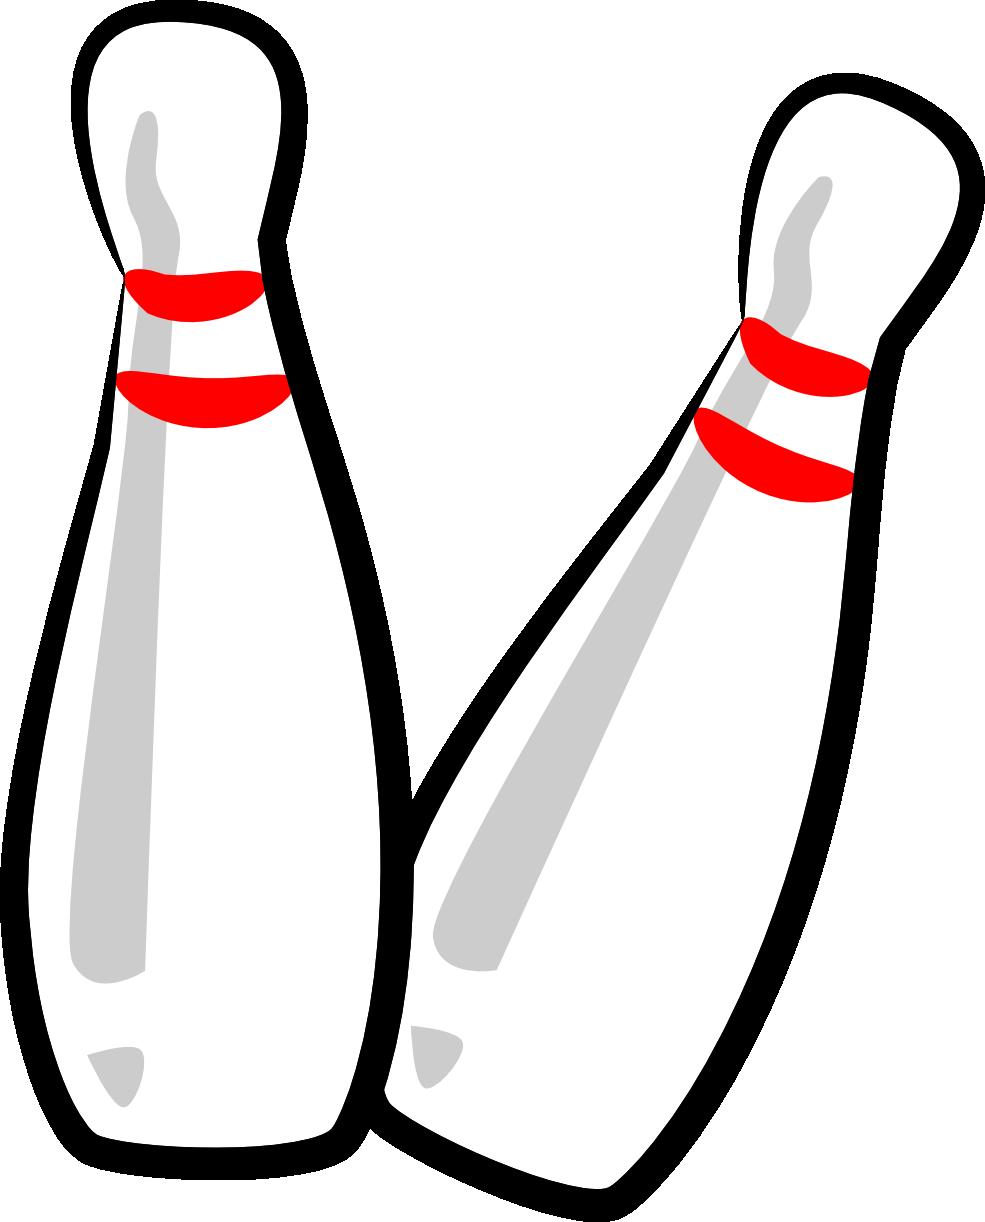 Bowling clipart summer. Saratoga central catholic team